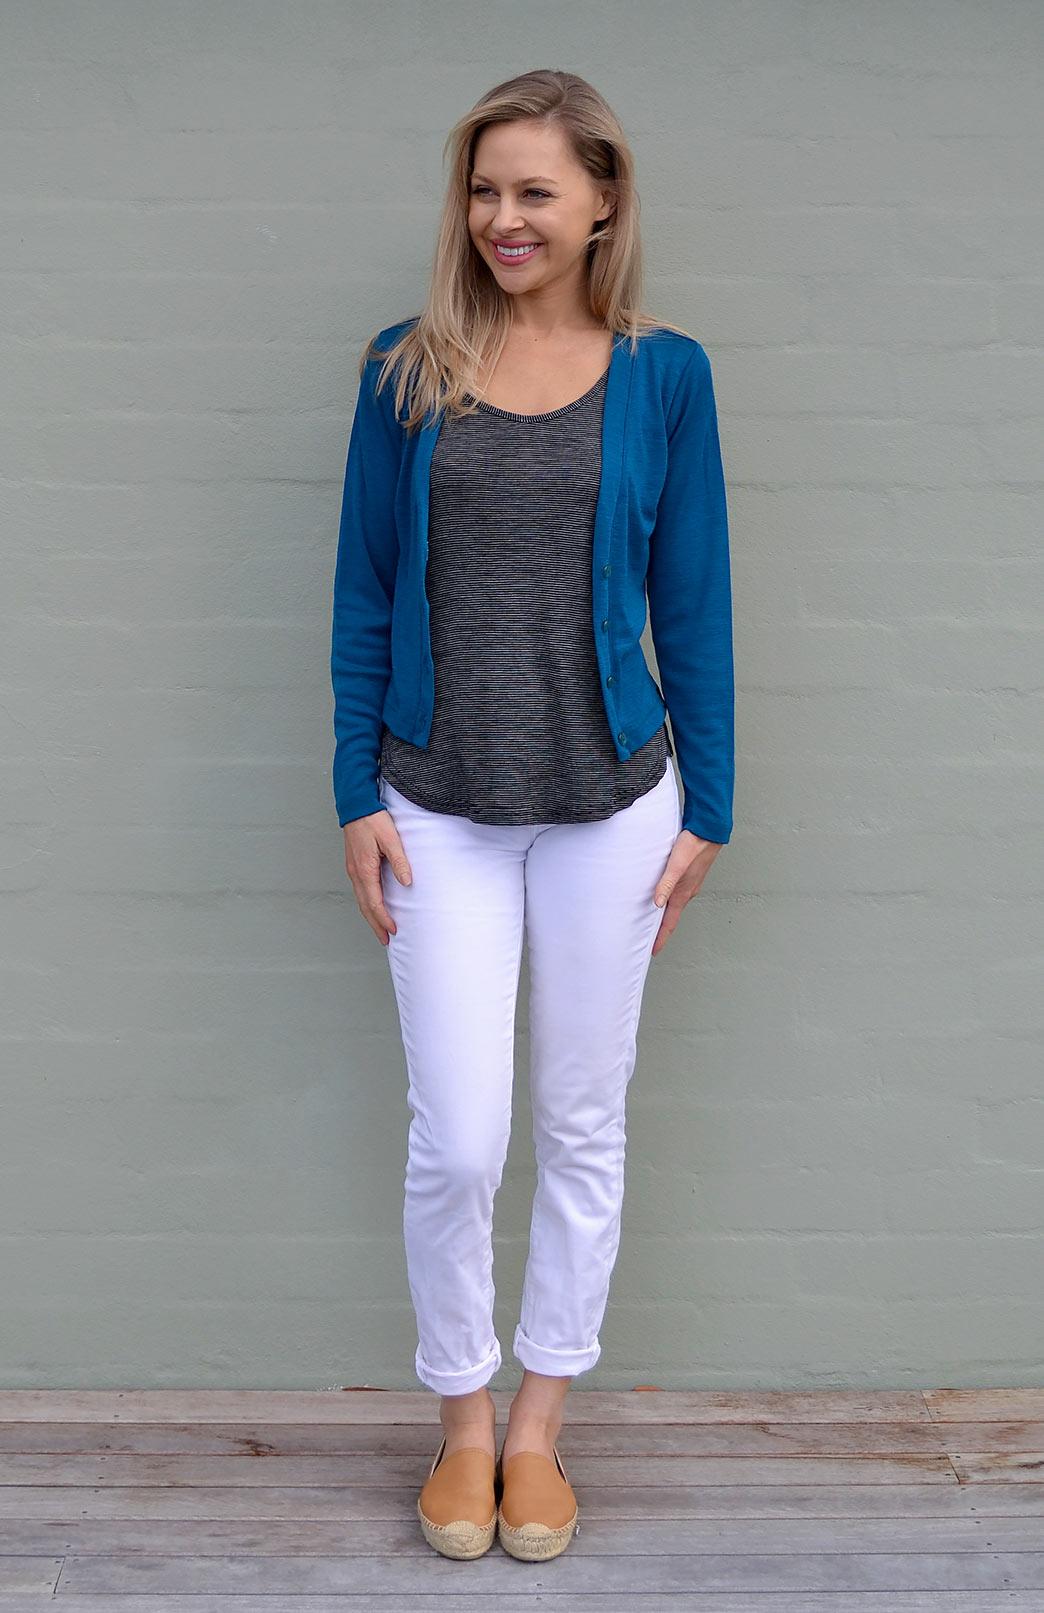 Crop Cardigan - Long Sleeved - Women's Teal Long Sleeve Merino Wool Cropped Cardigan with Buttons - Smitten Merino Tasmania Australia